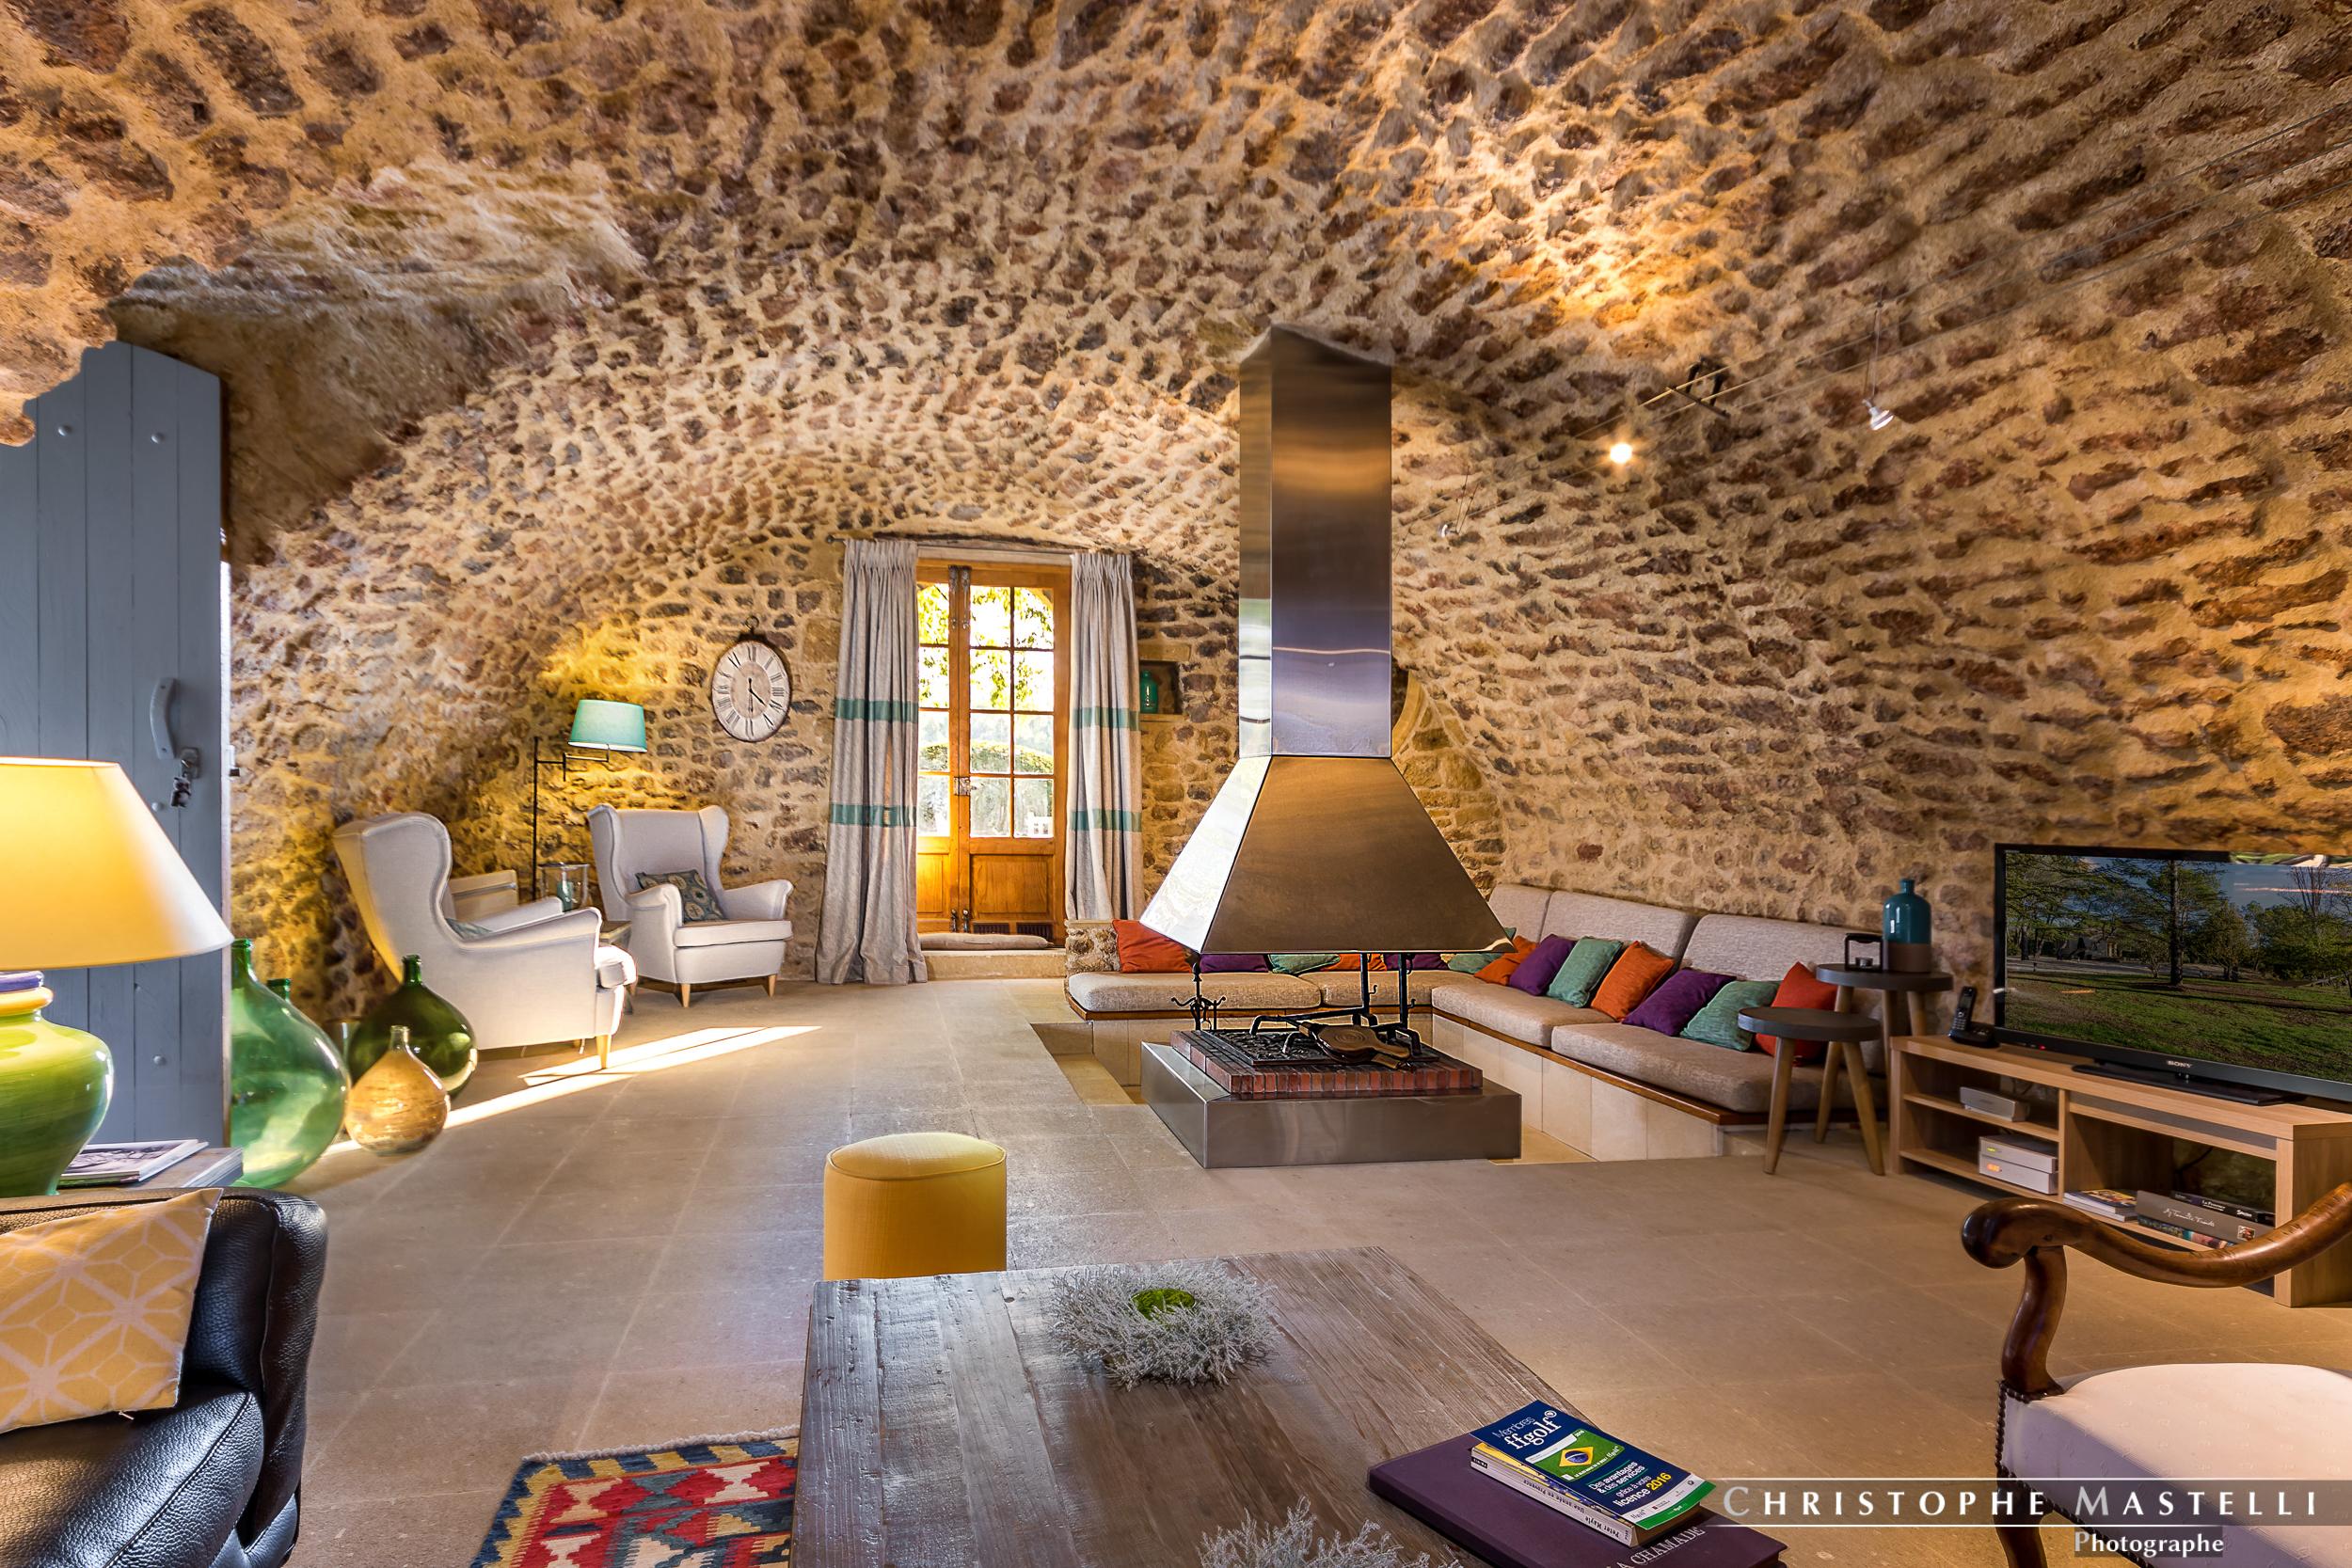 architecture-intereiur-designer-christophe mastelli photographe marseille